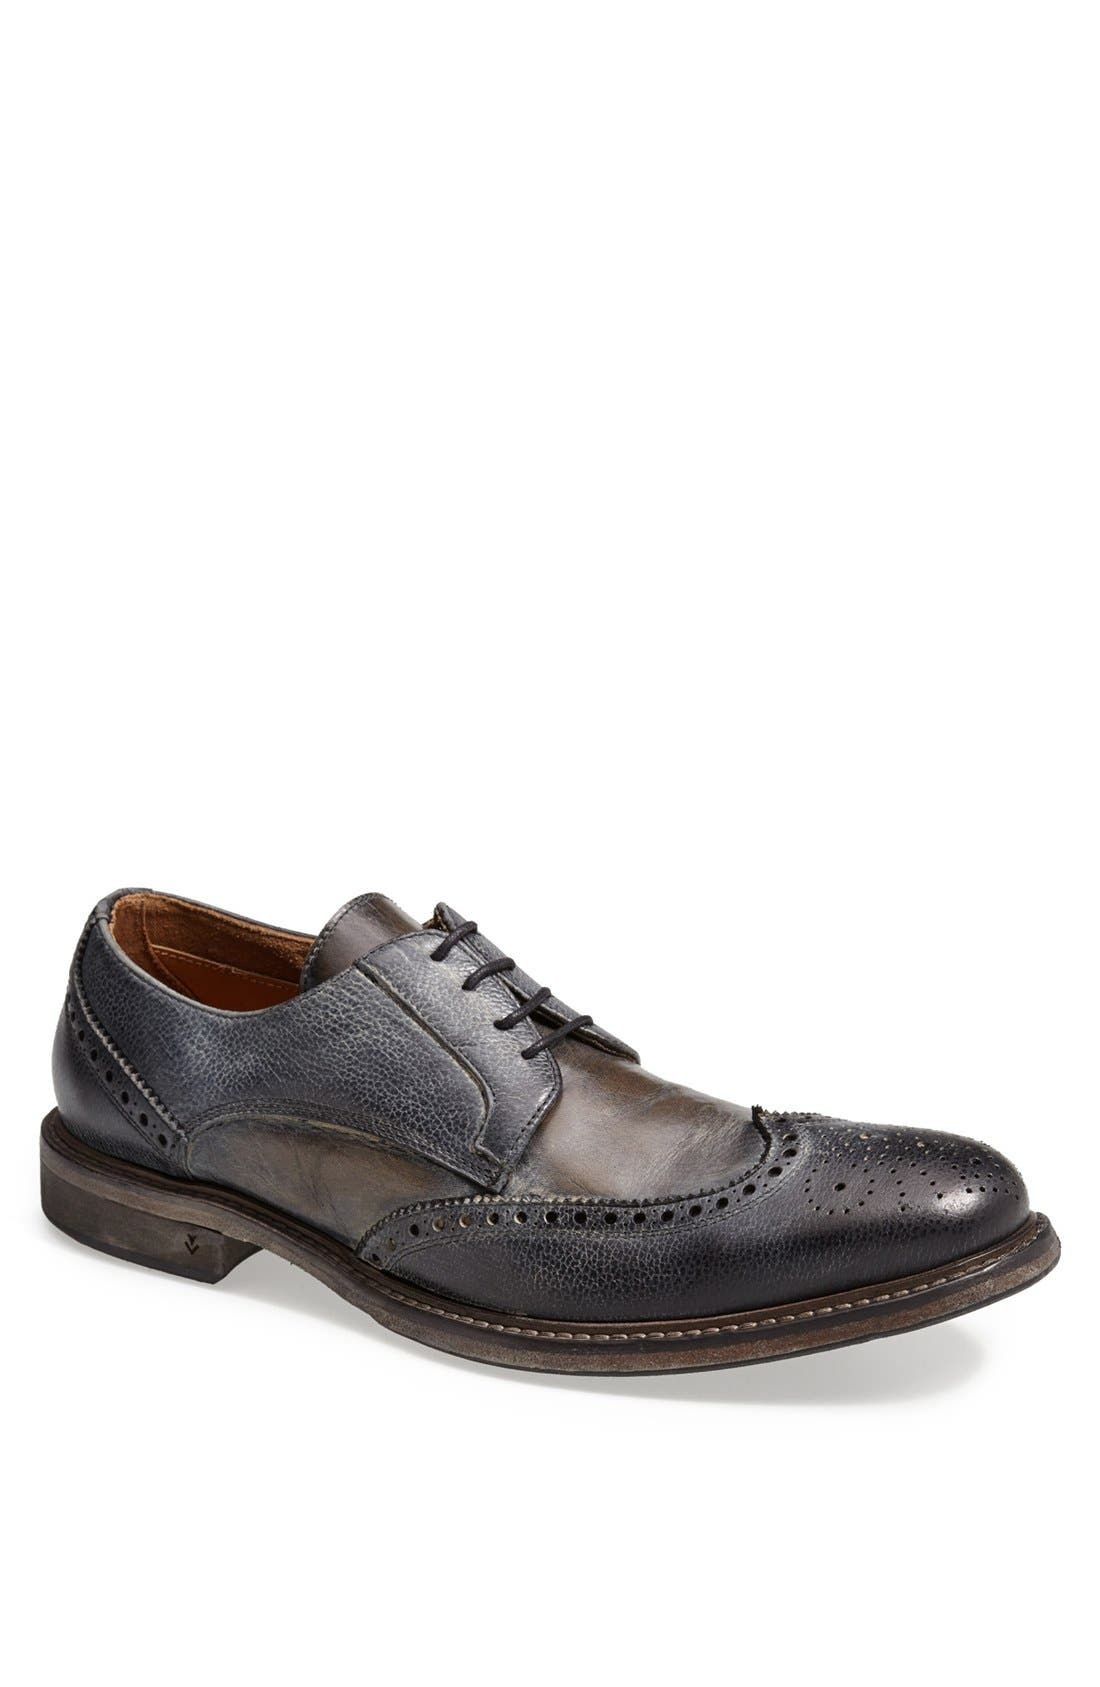 Alternate Image 1 Selected - John Varvatos Collection 'College' Spectator Shoe